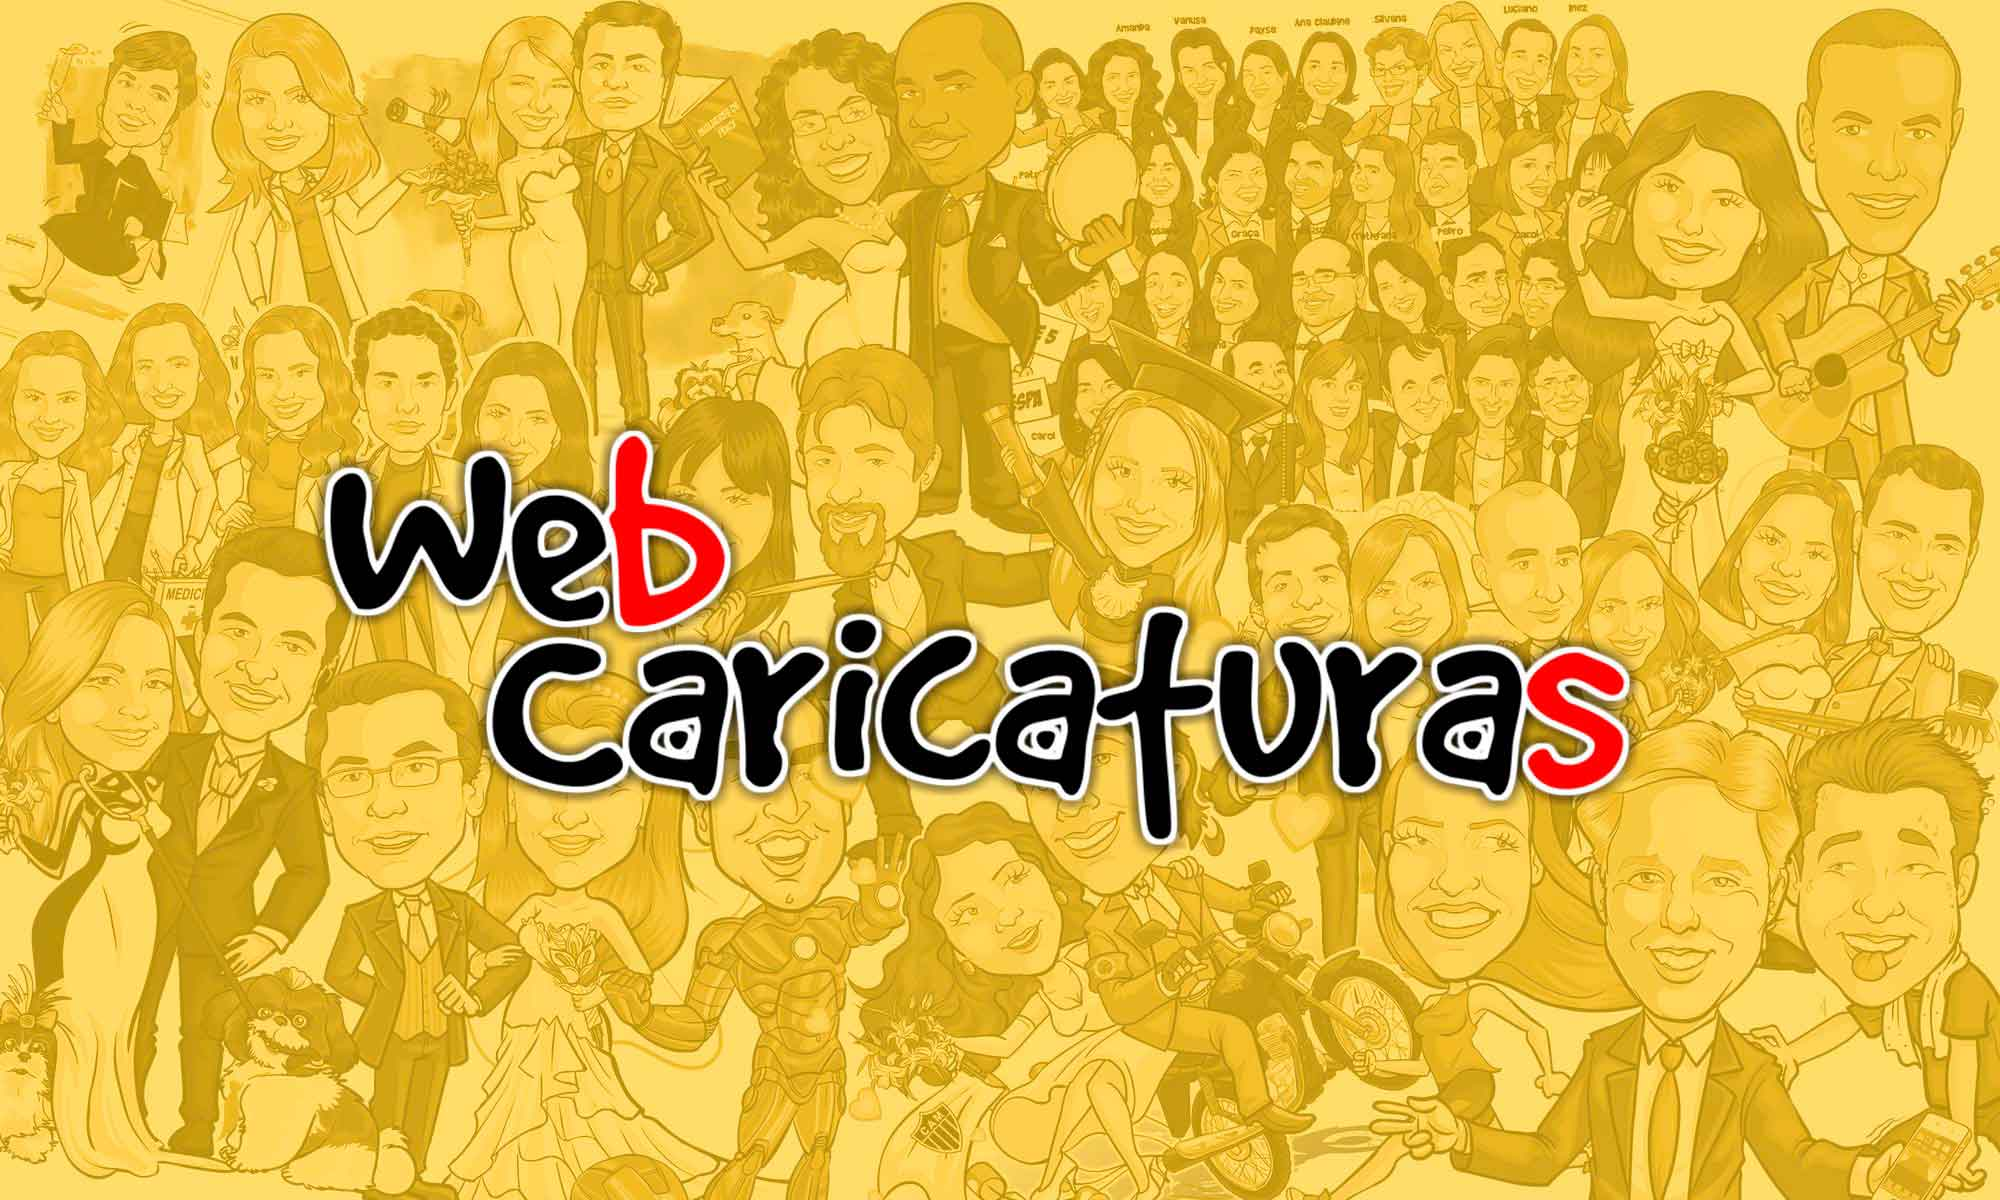 web caricaturas